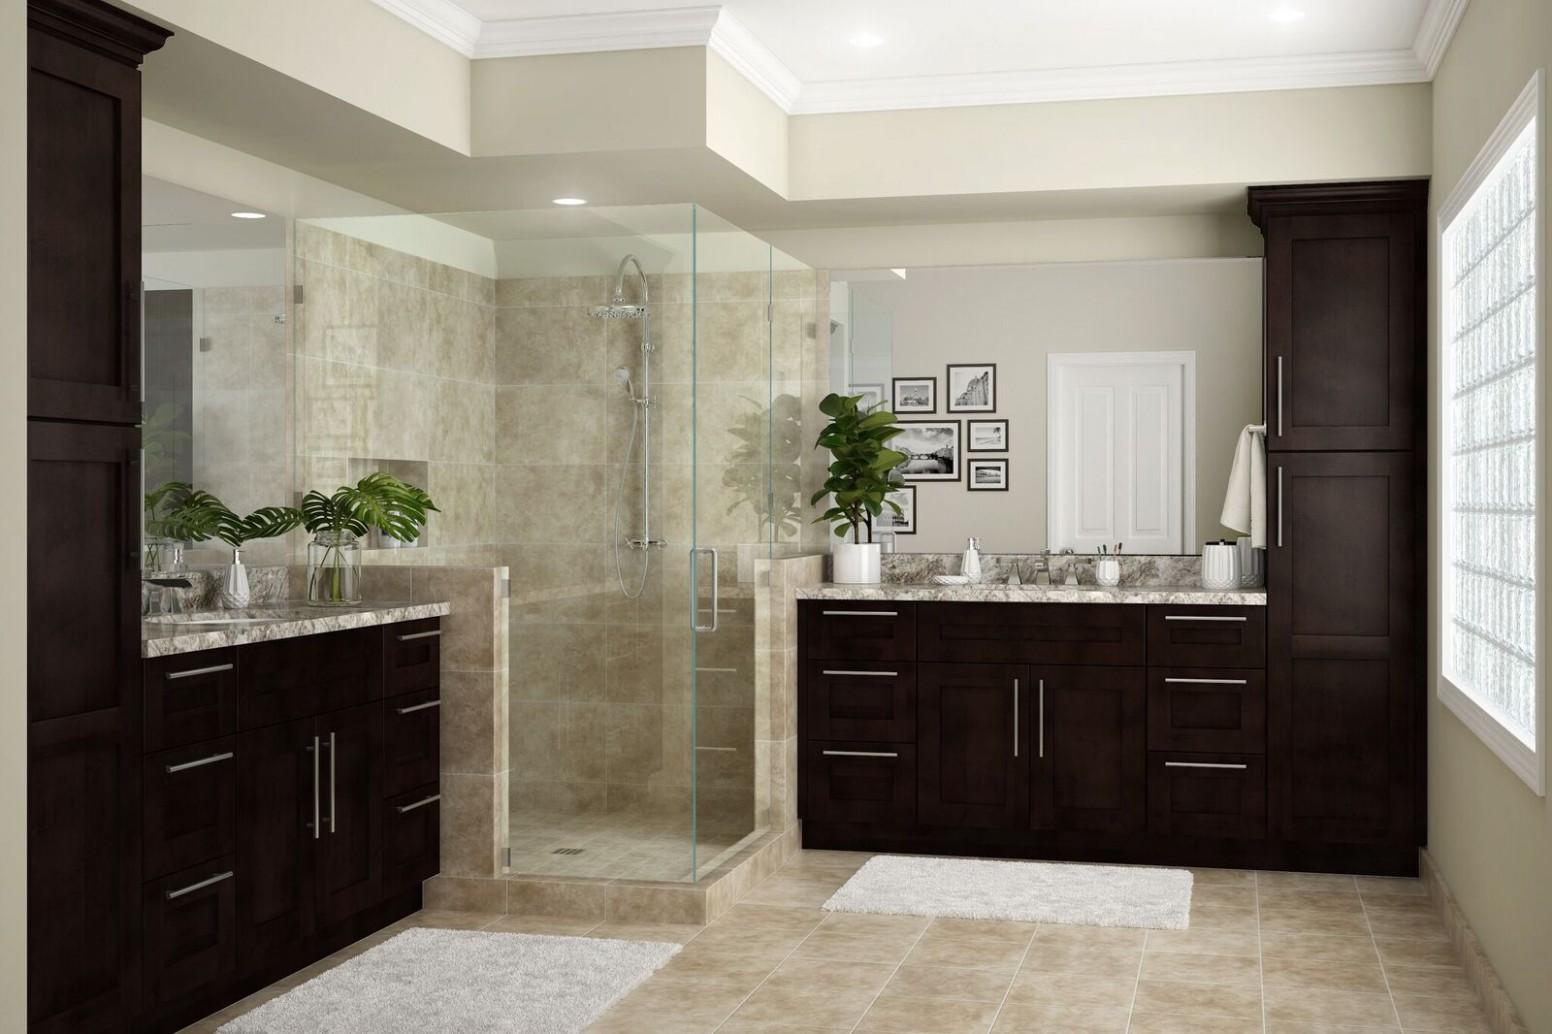 Franklin Bath Cabinets in Manganite – Kitchen – The Home Depot - Franklin Kitchen Cabinets